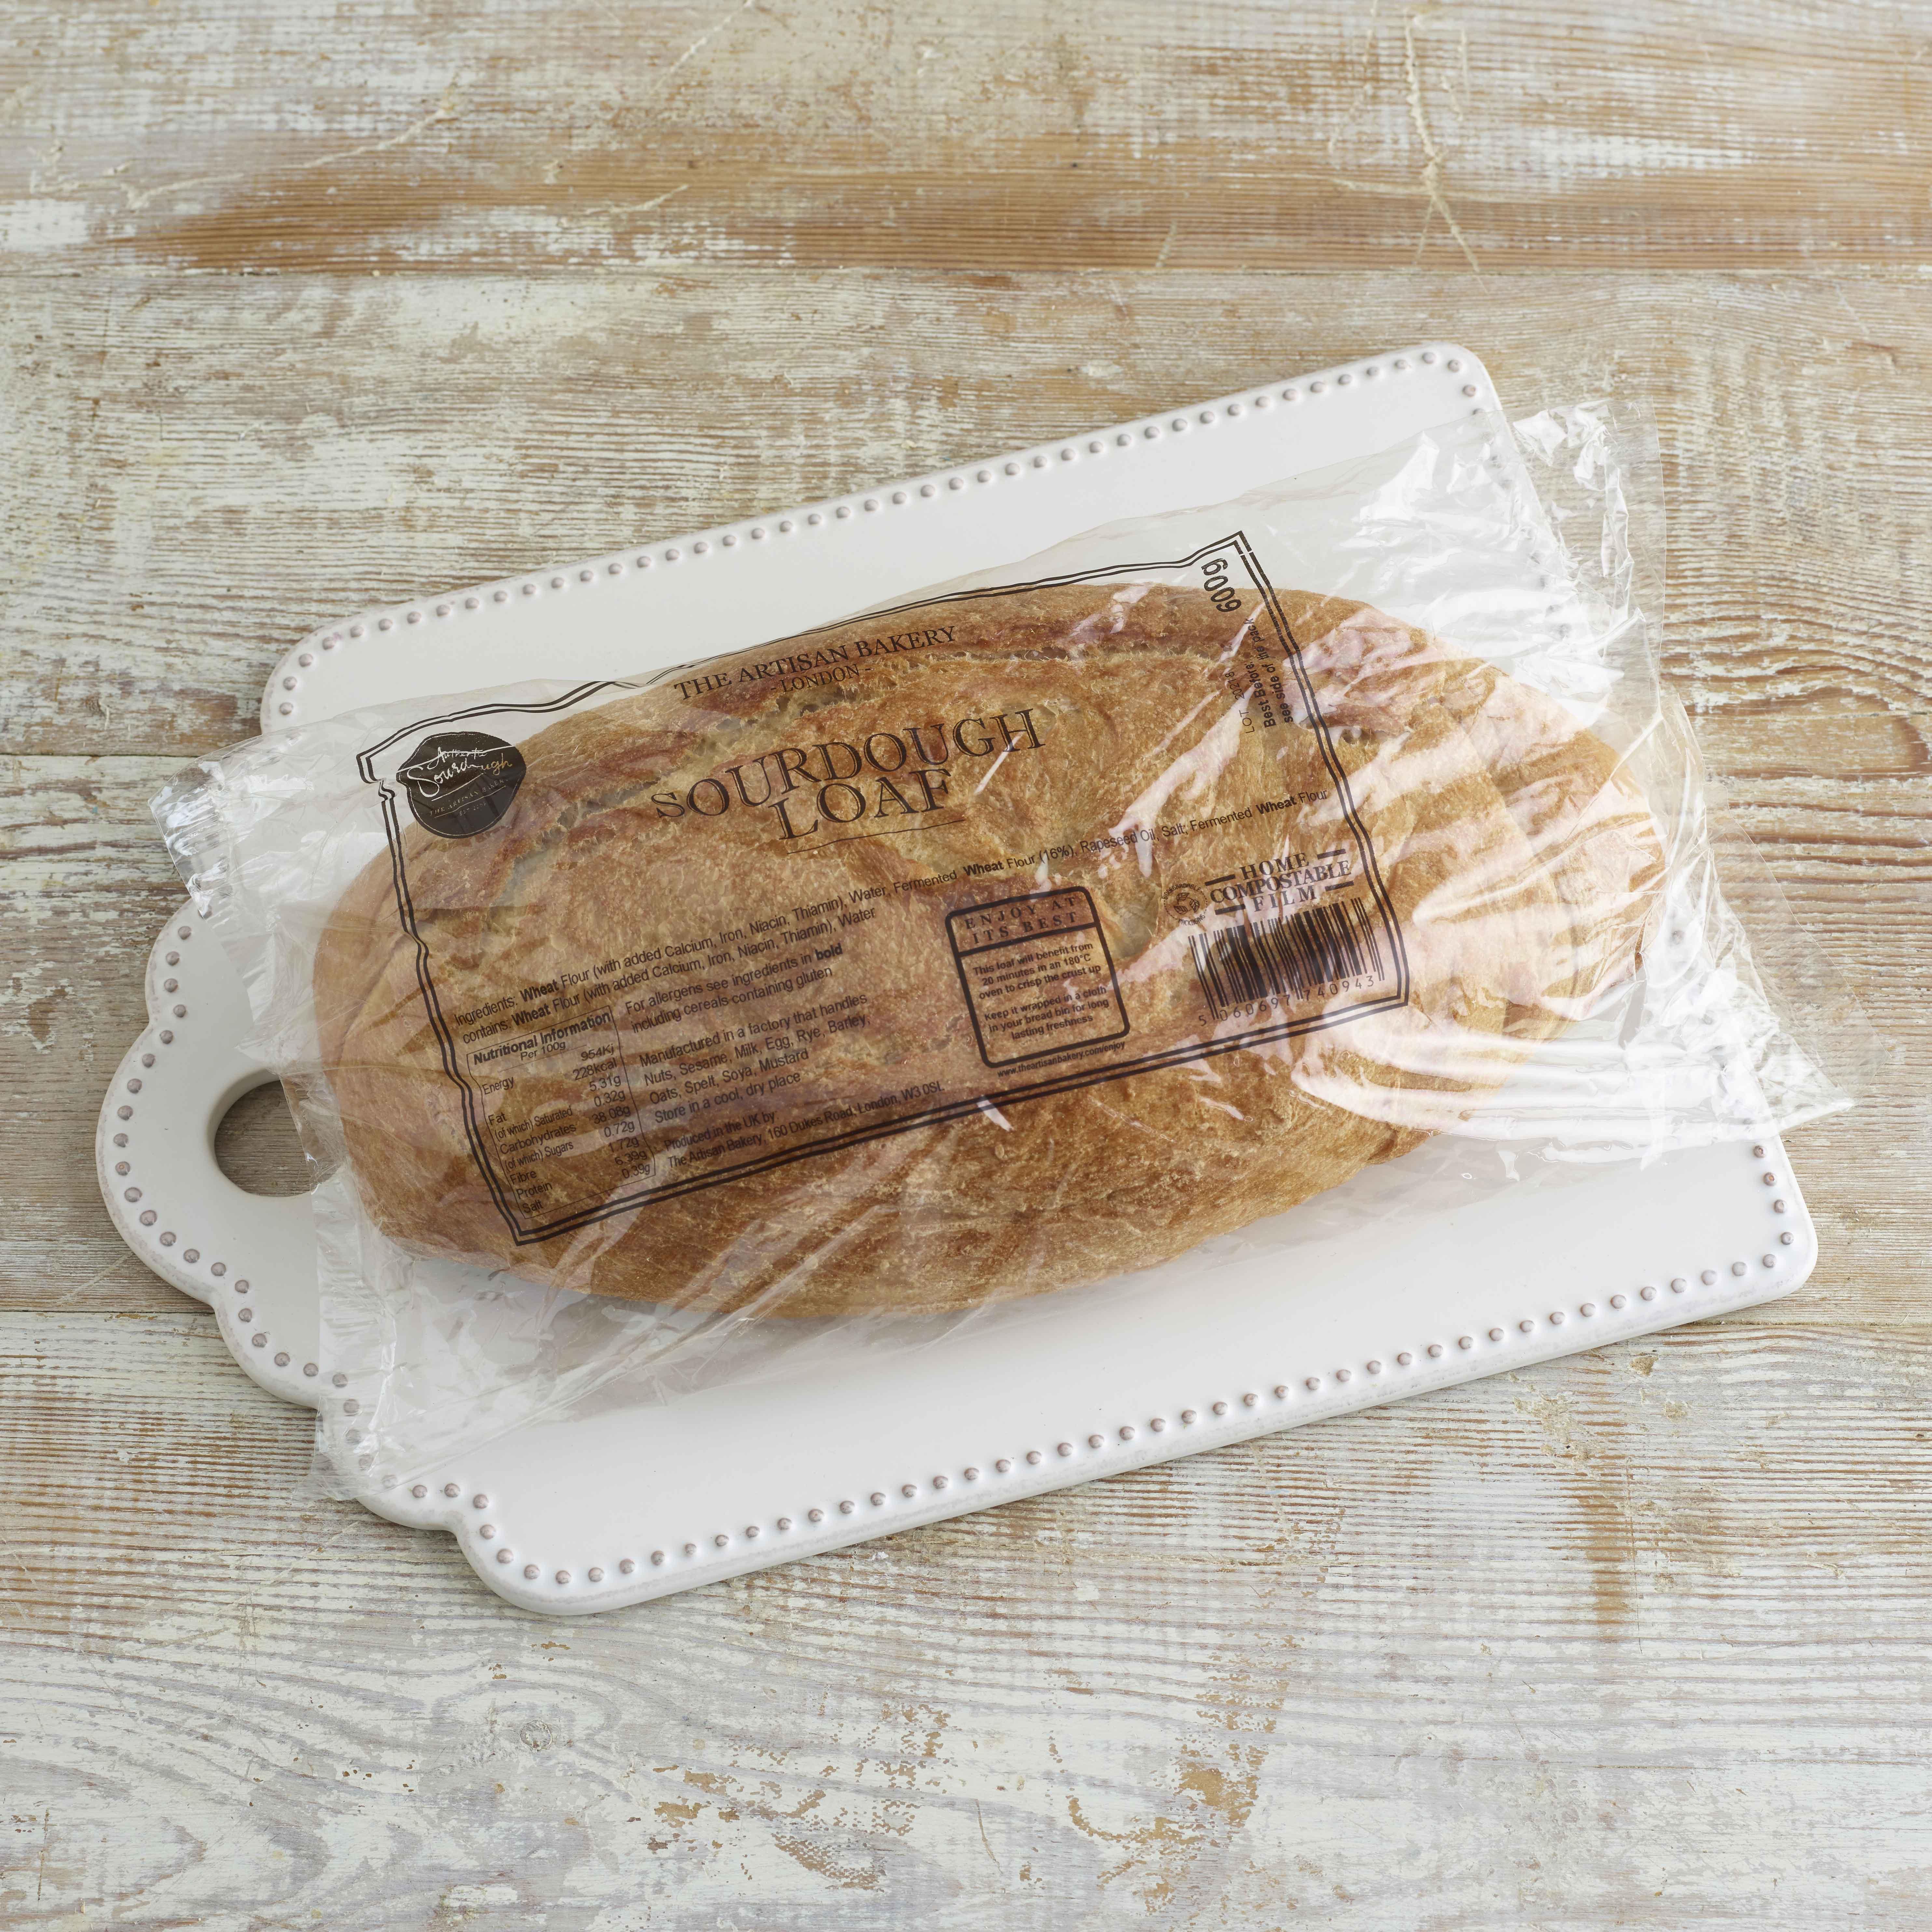 Artisan Bakery Sourdough Loaf, 600g